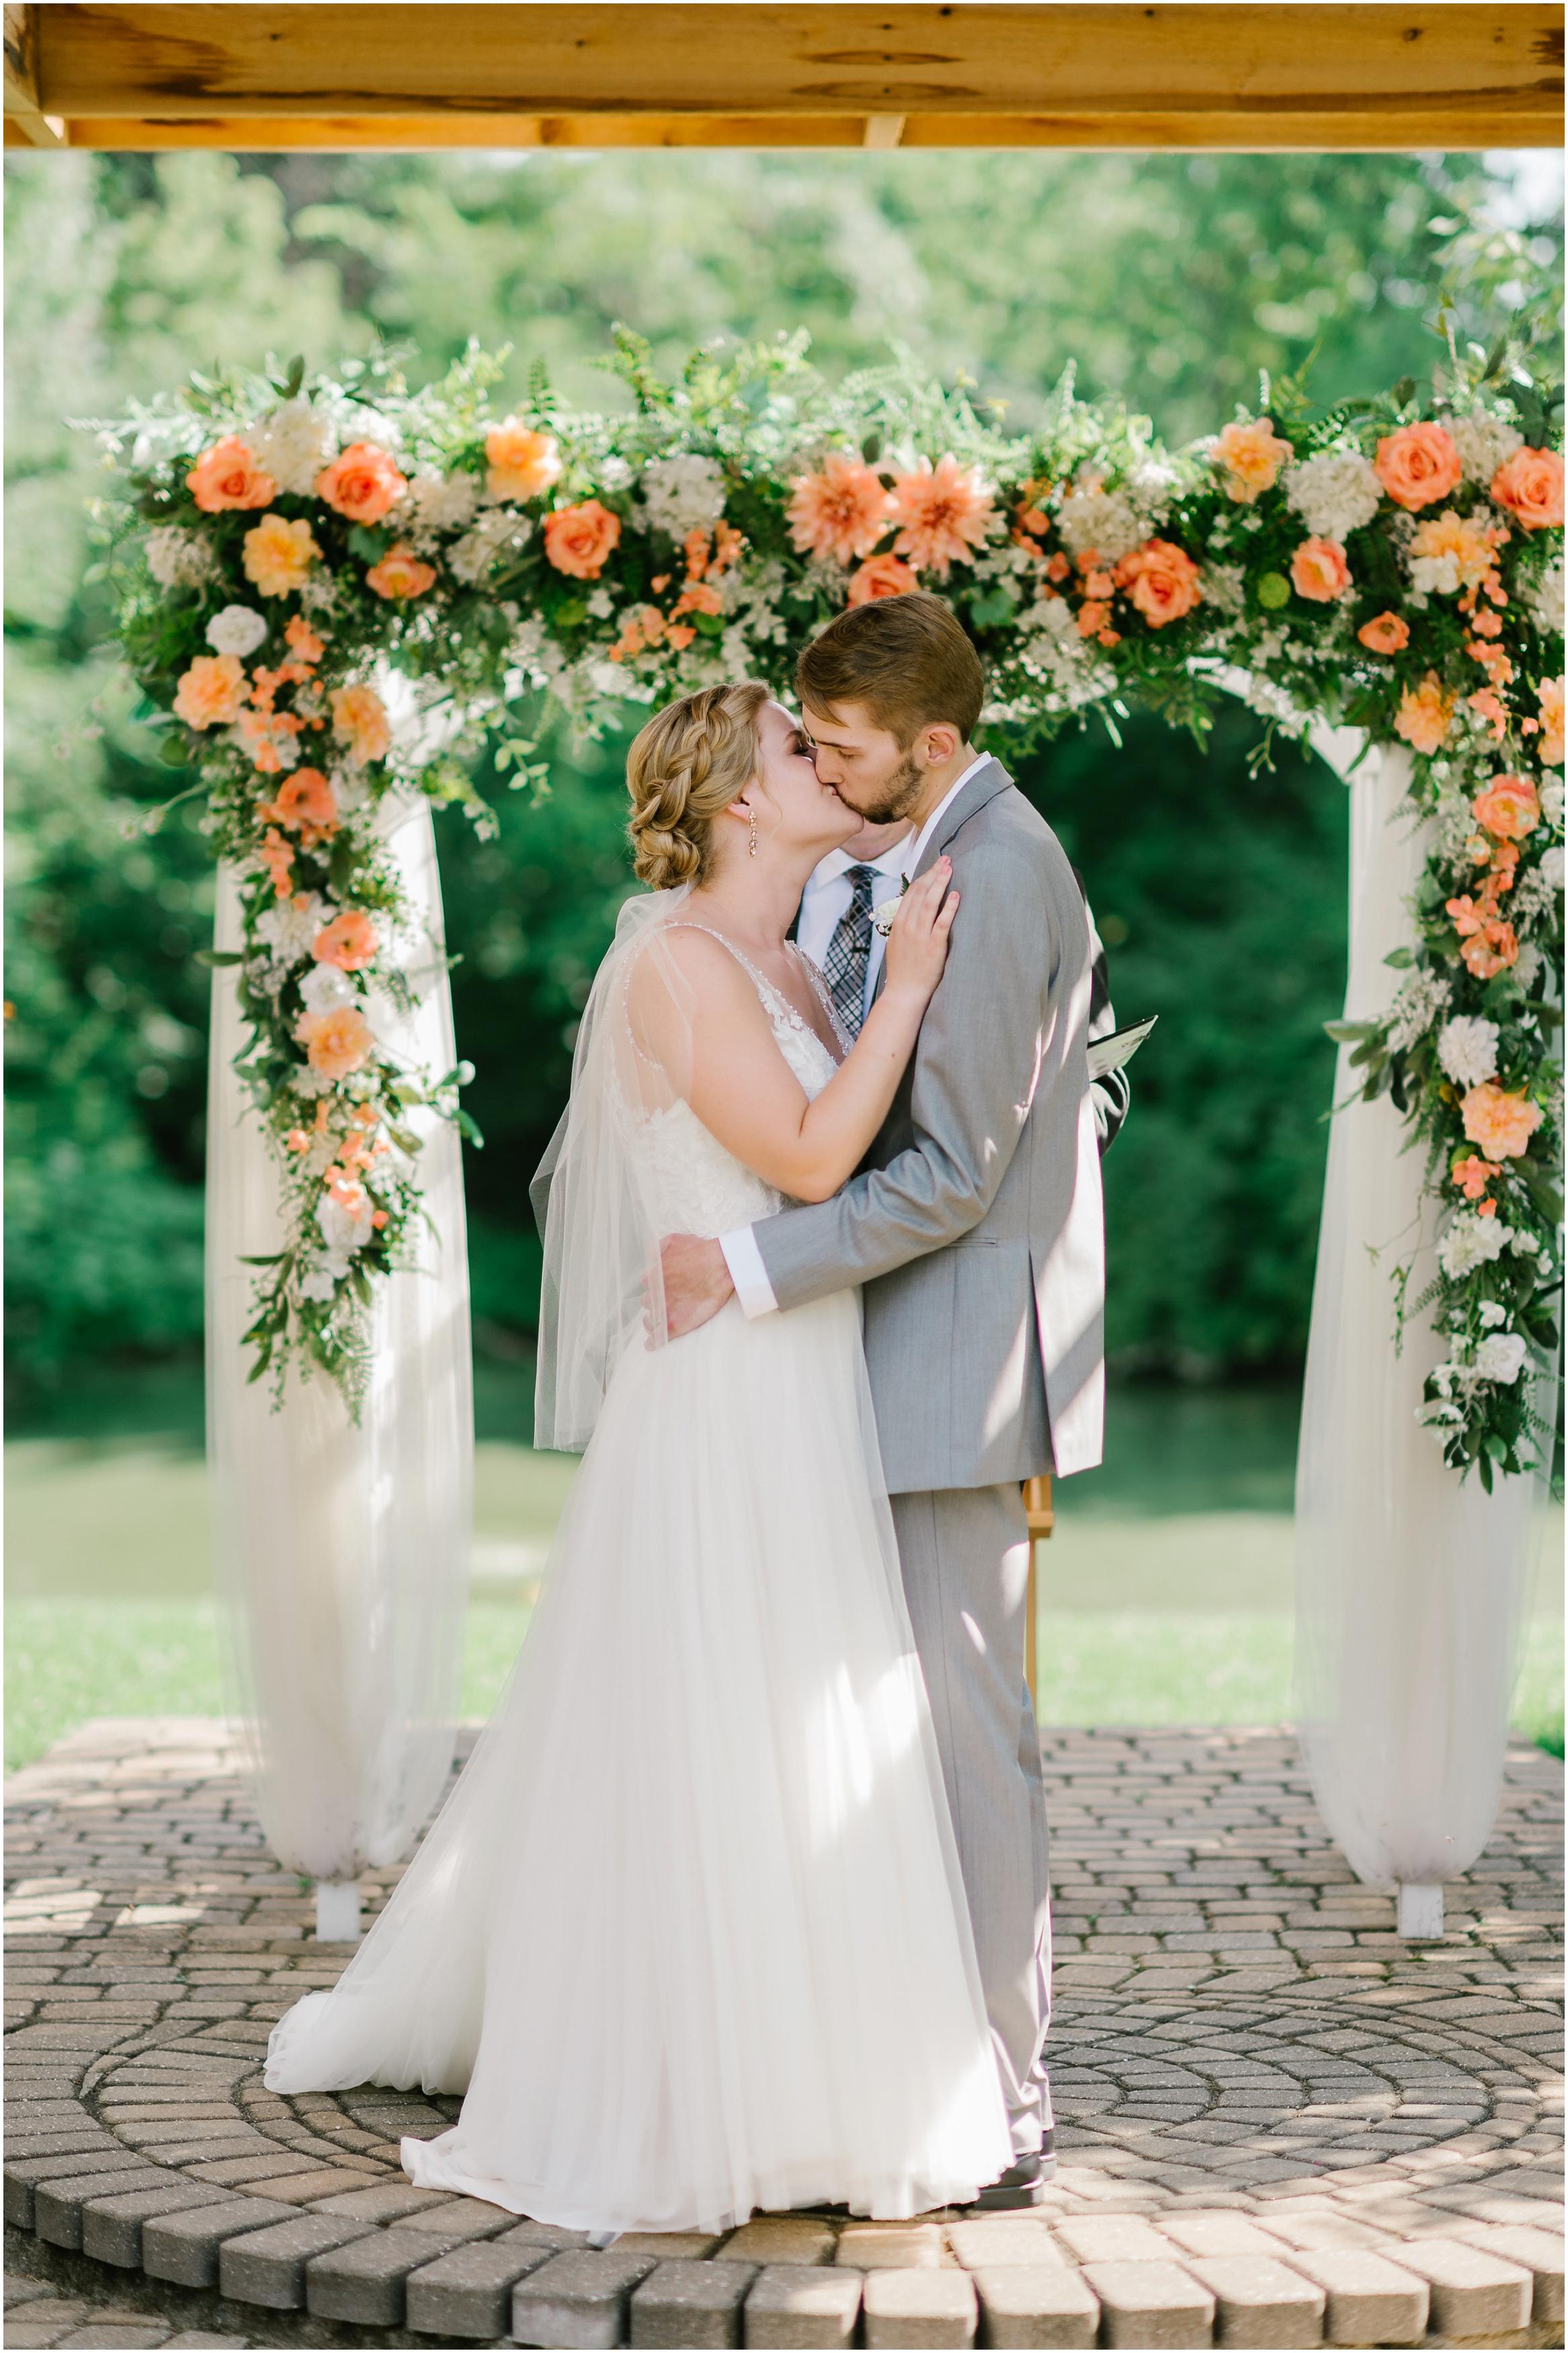 Rebecca_Shehorn_Photography_Indianapolis_Wedding_Photographer_8508.jpg